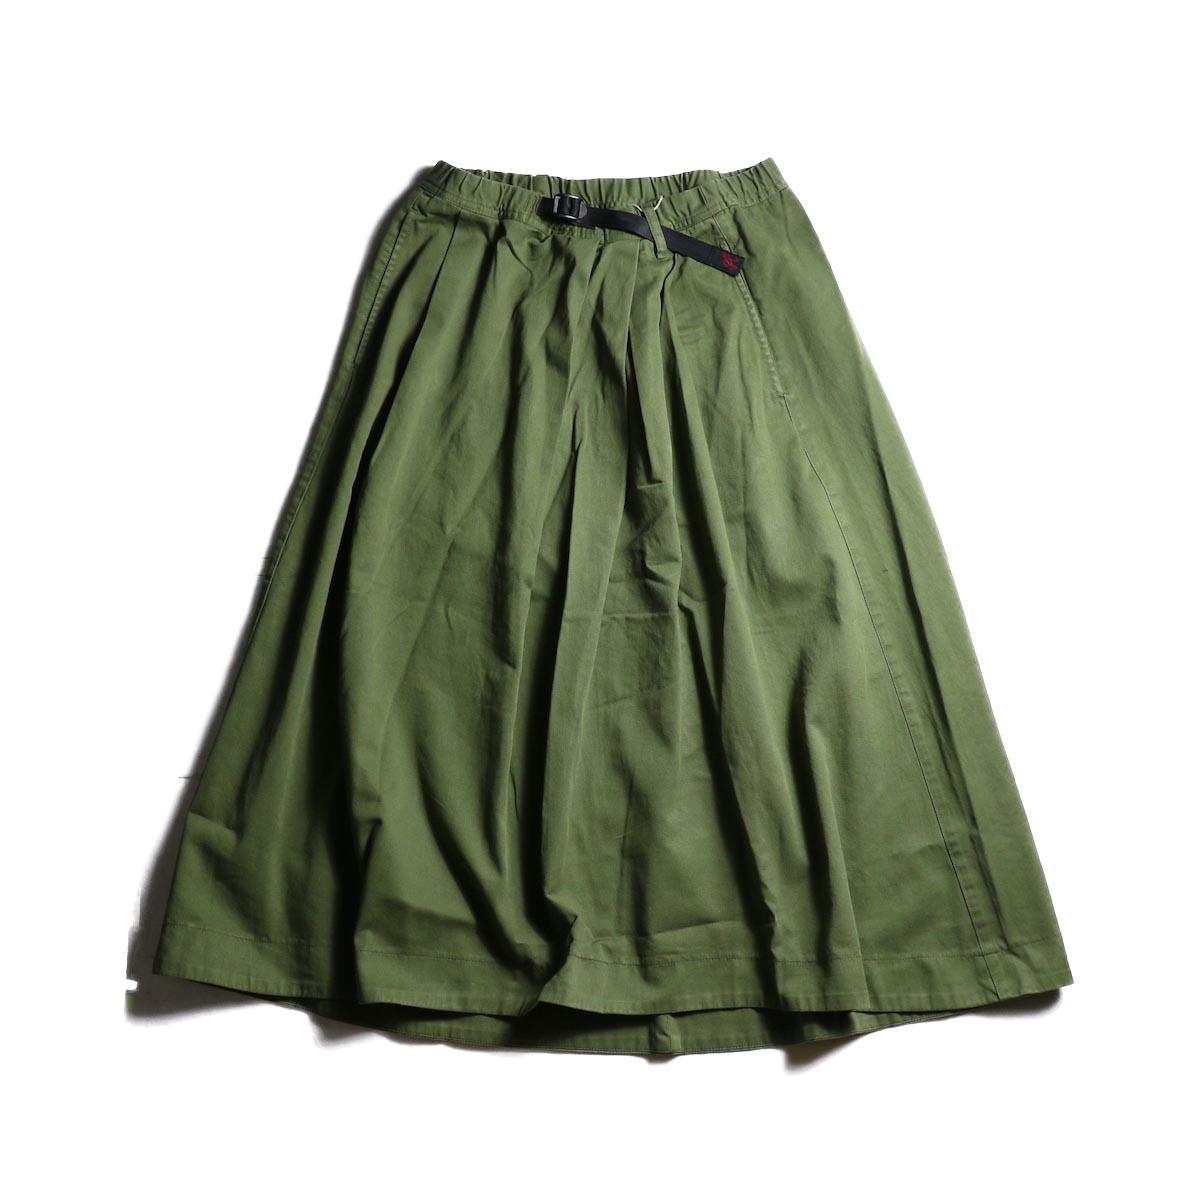 (Ladie's) GRAMICCI / Tale Cut Skirt (Olive)